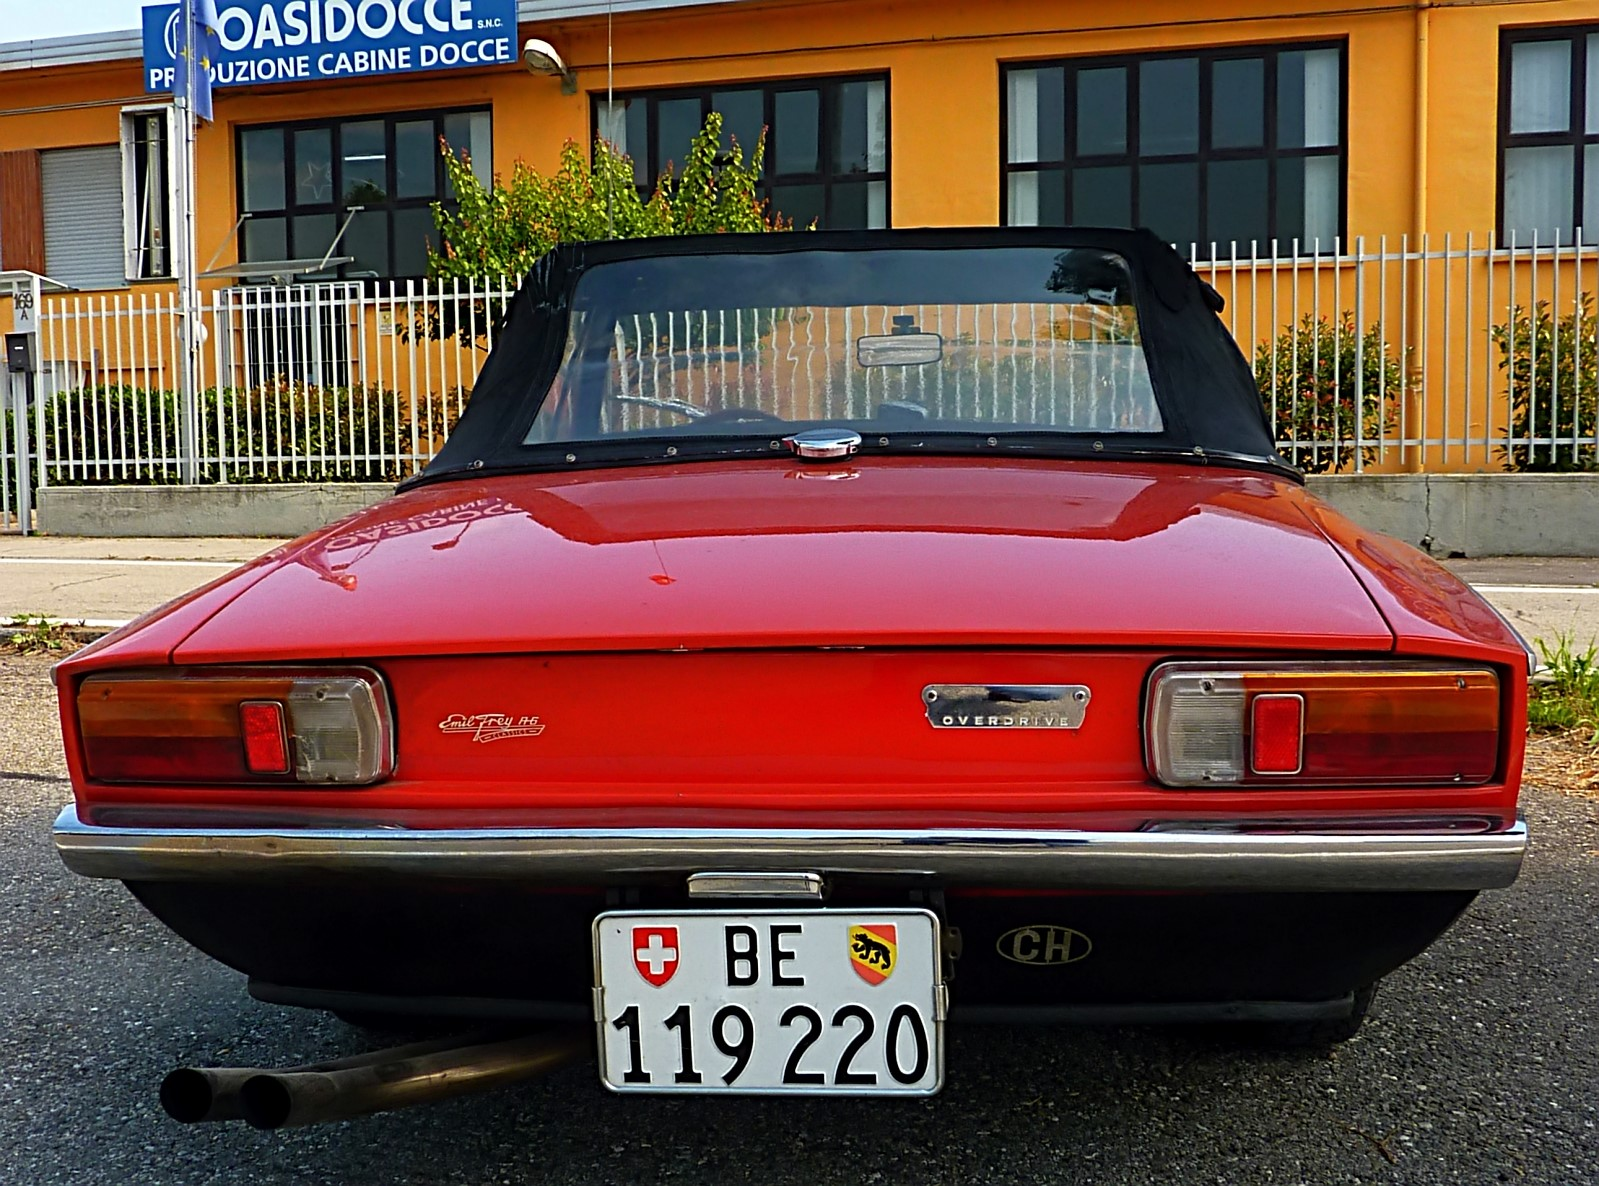 1968 Michelotti TR5 Ginevra Prototype (7)